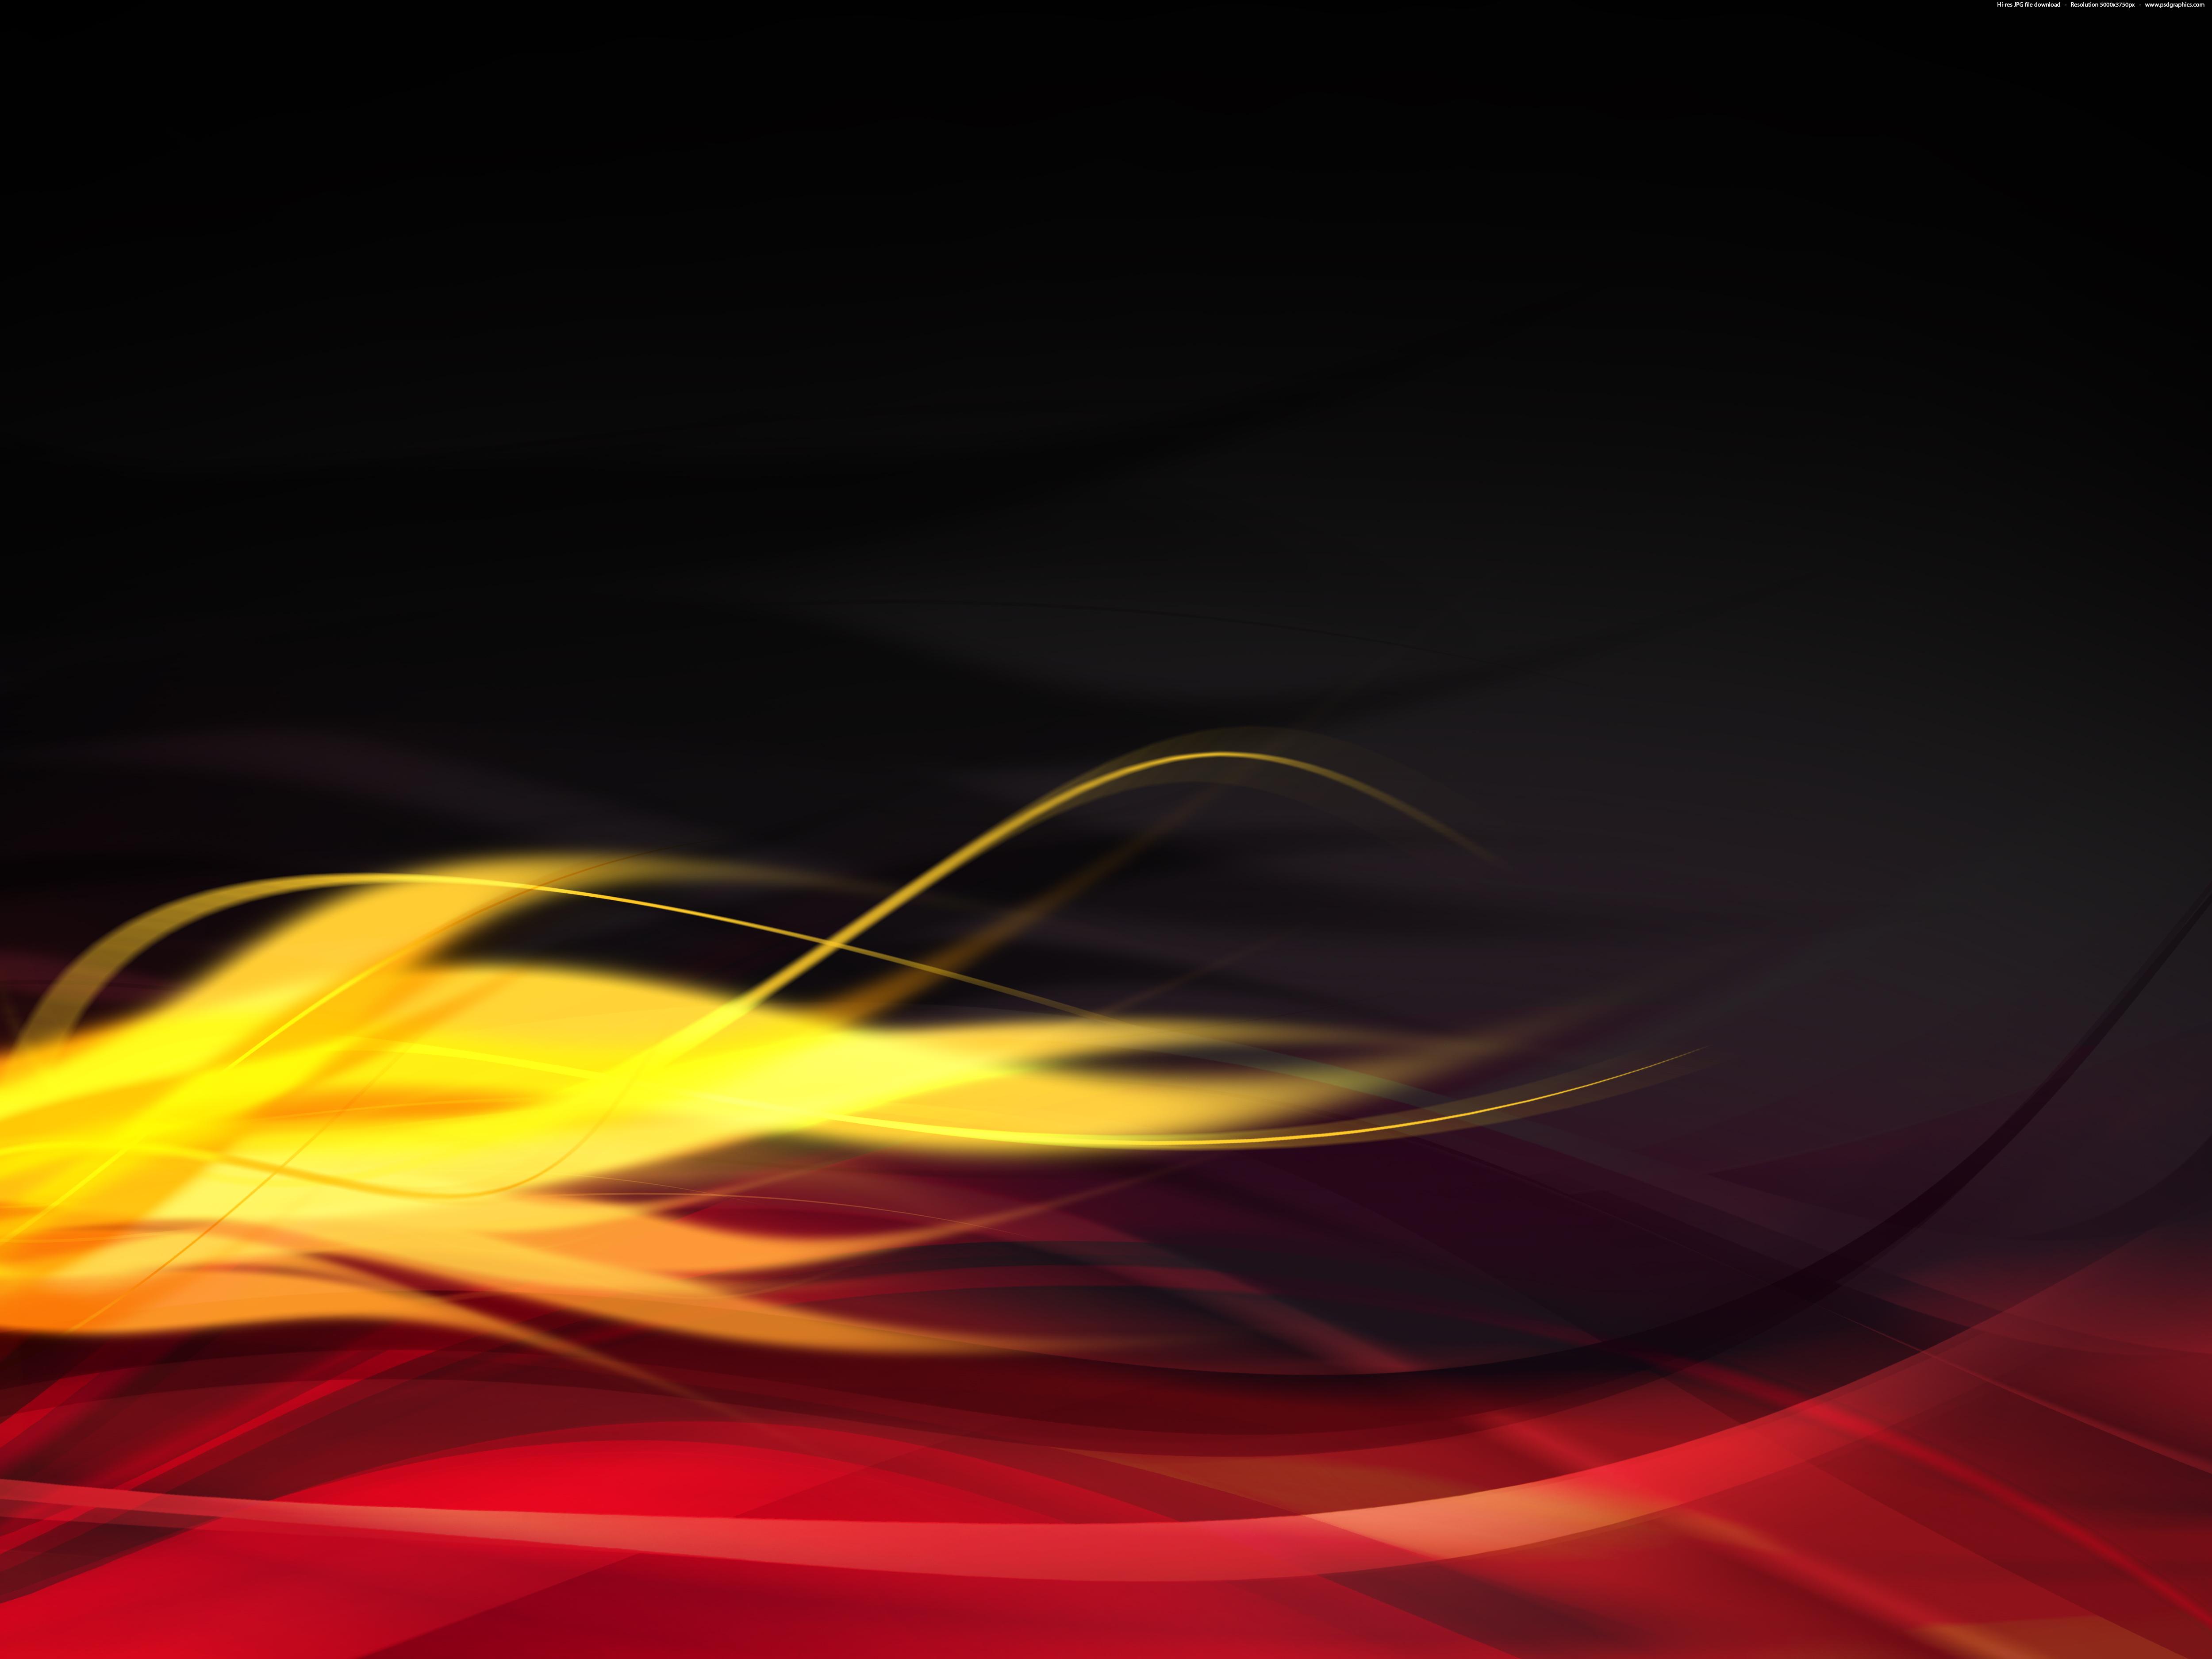 Hot Flames Black Background Psdgraphics